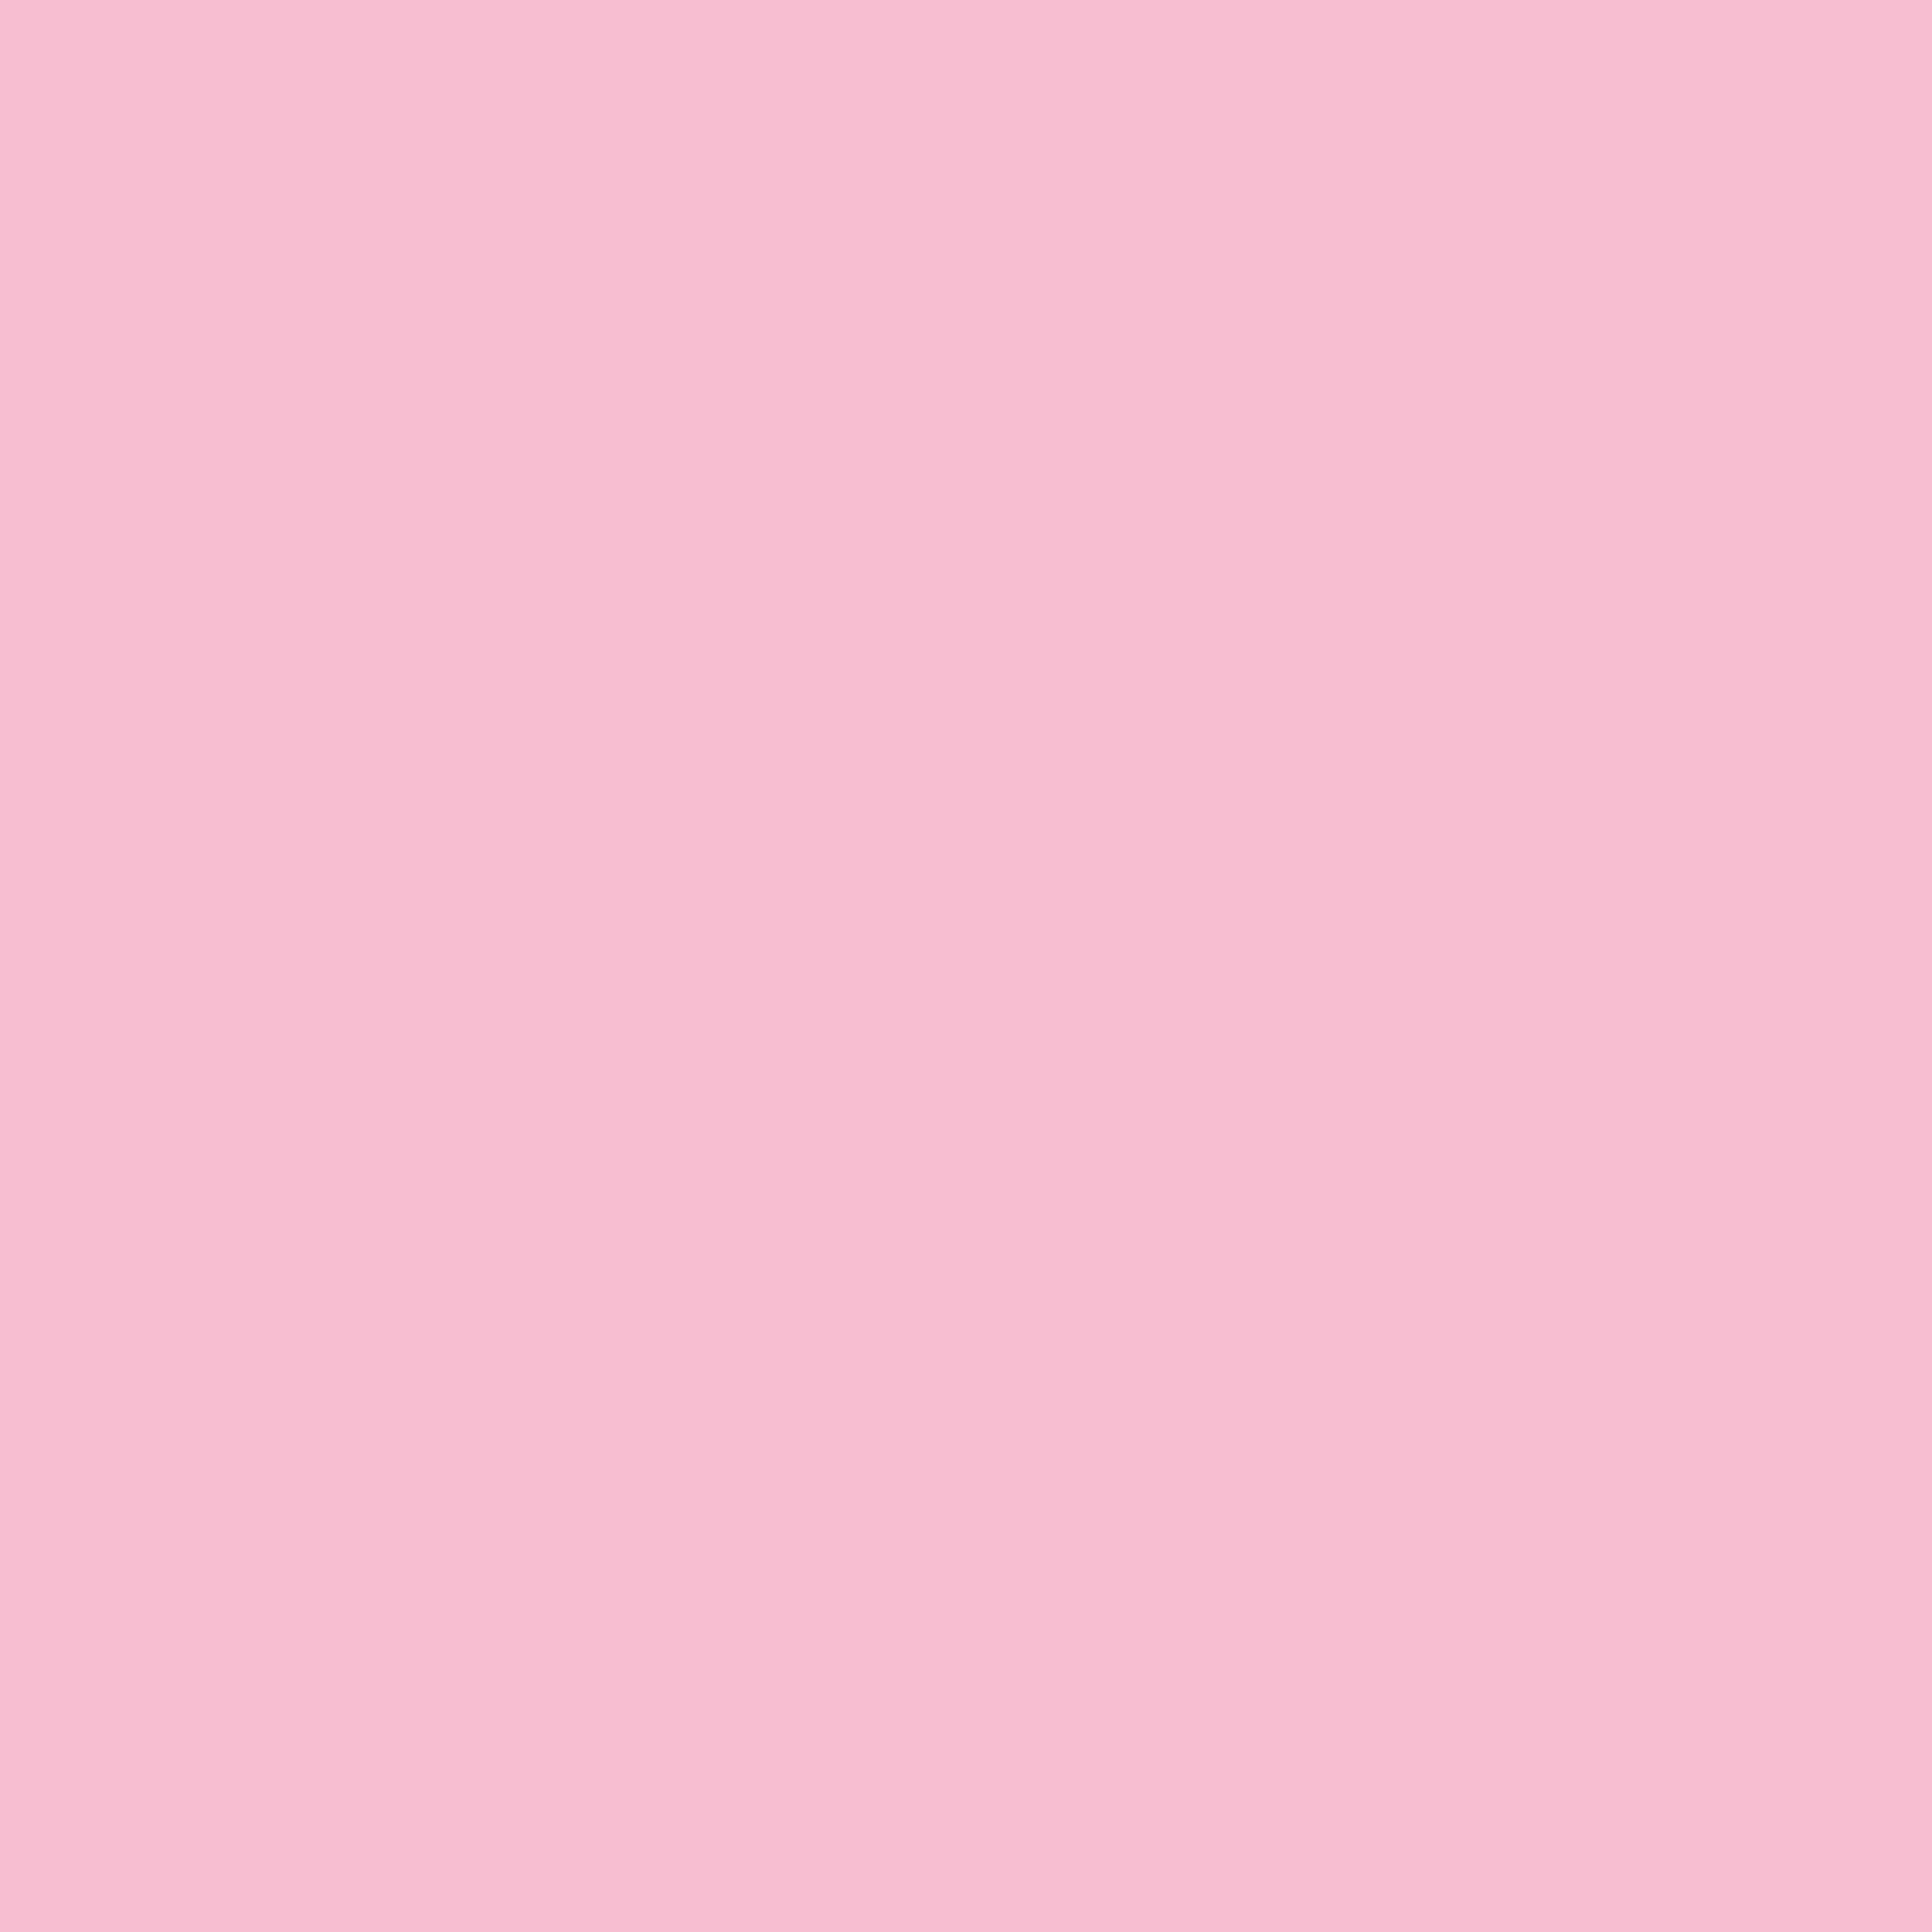 light_pink1.jpg